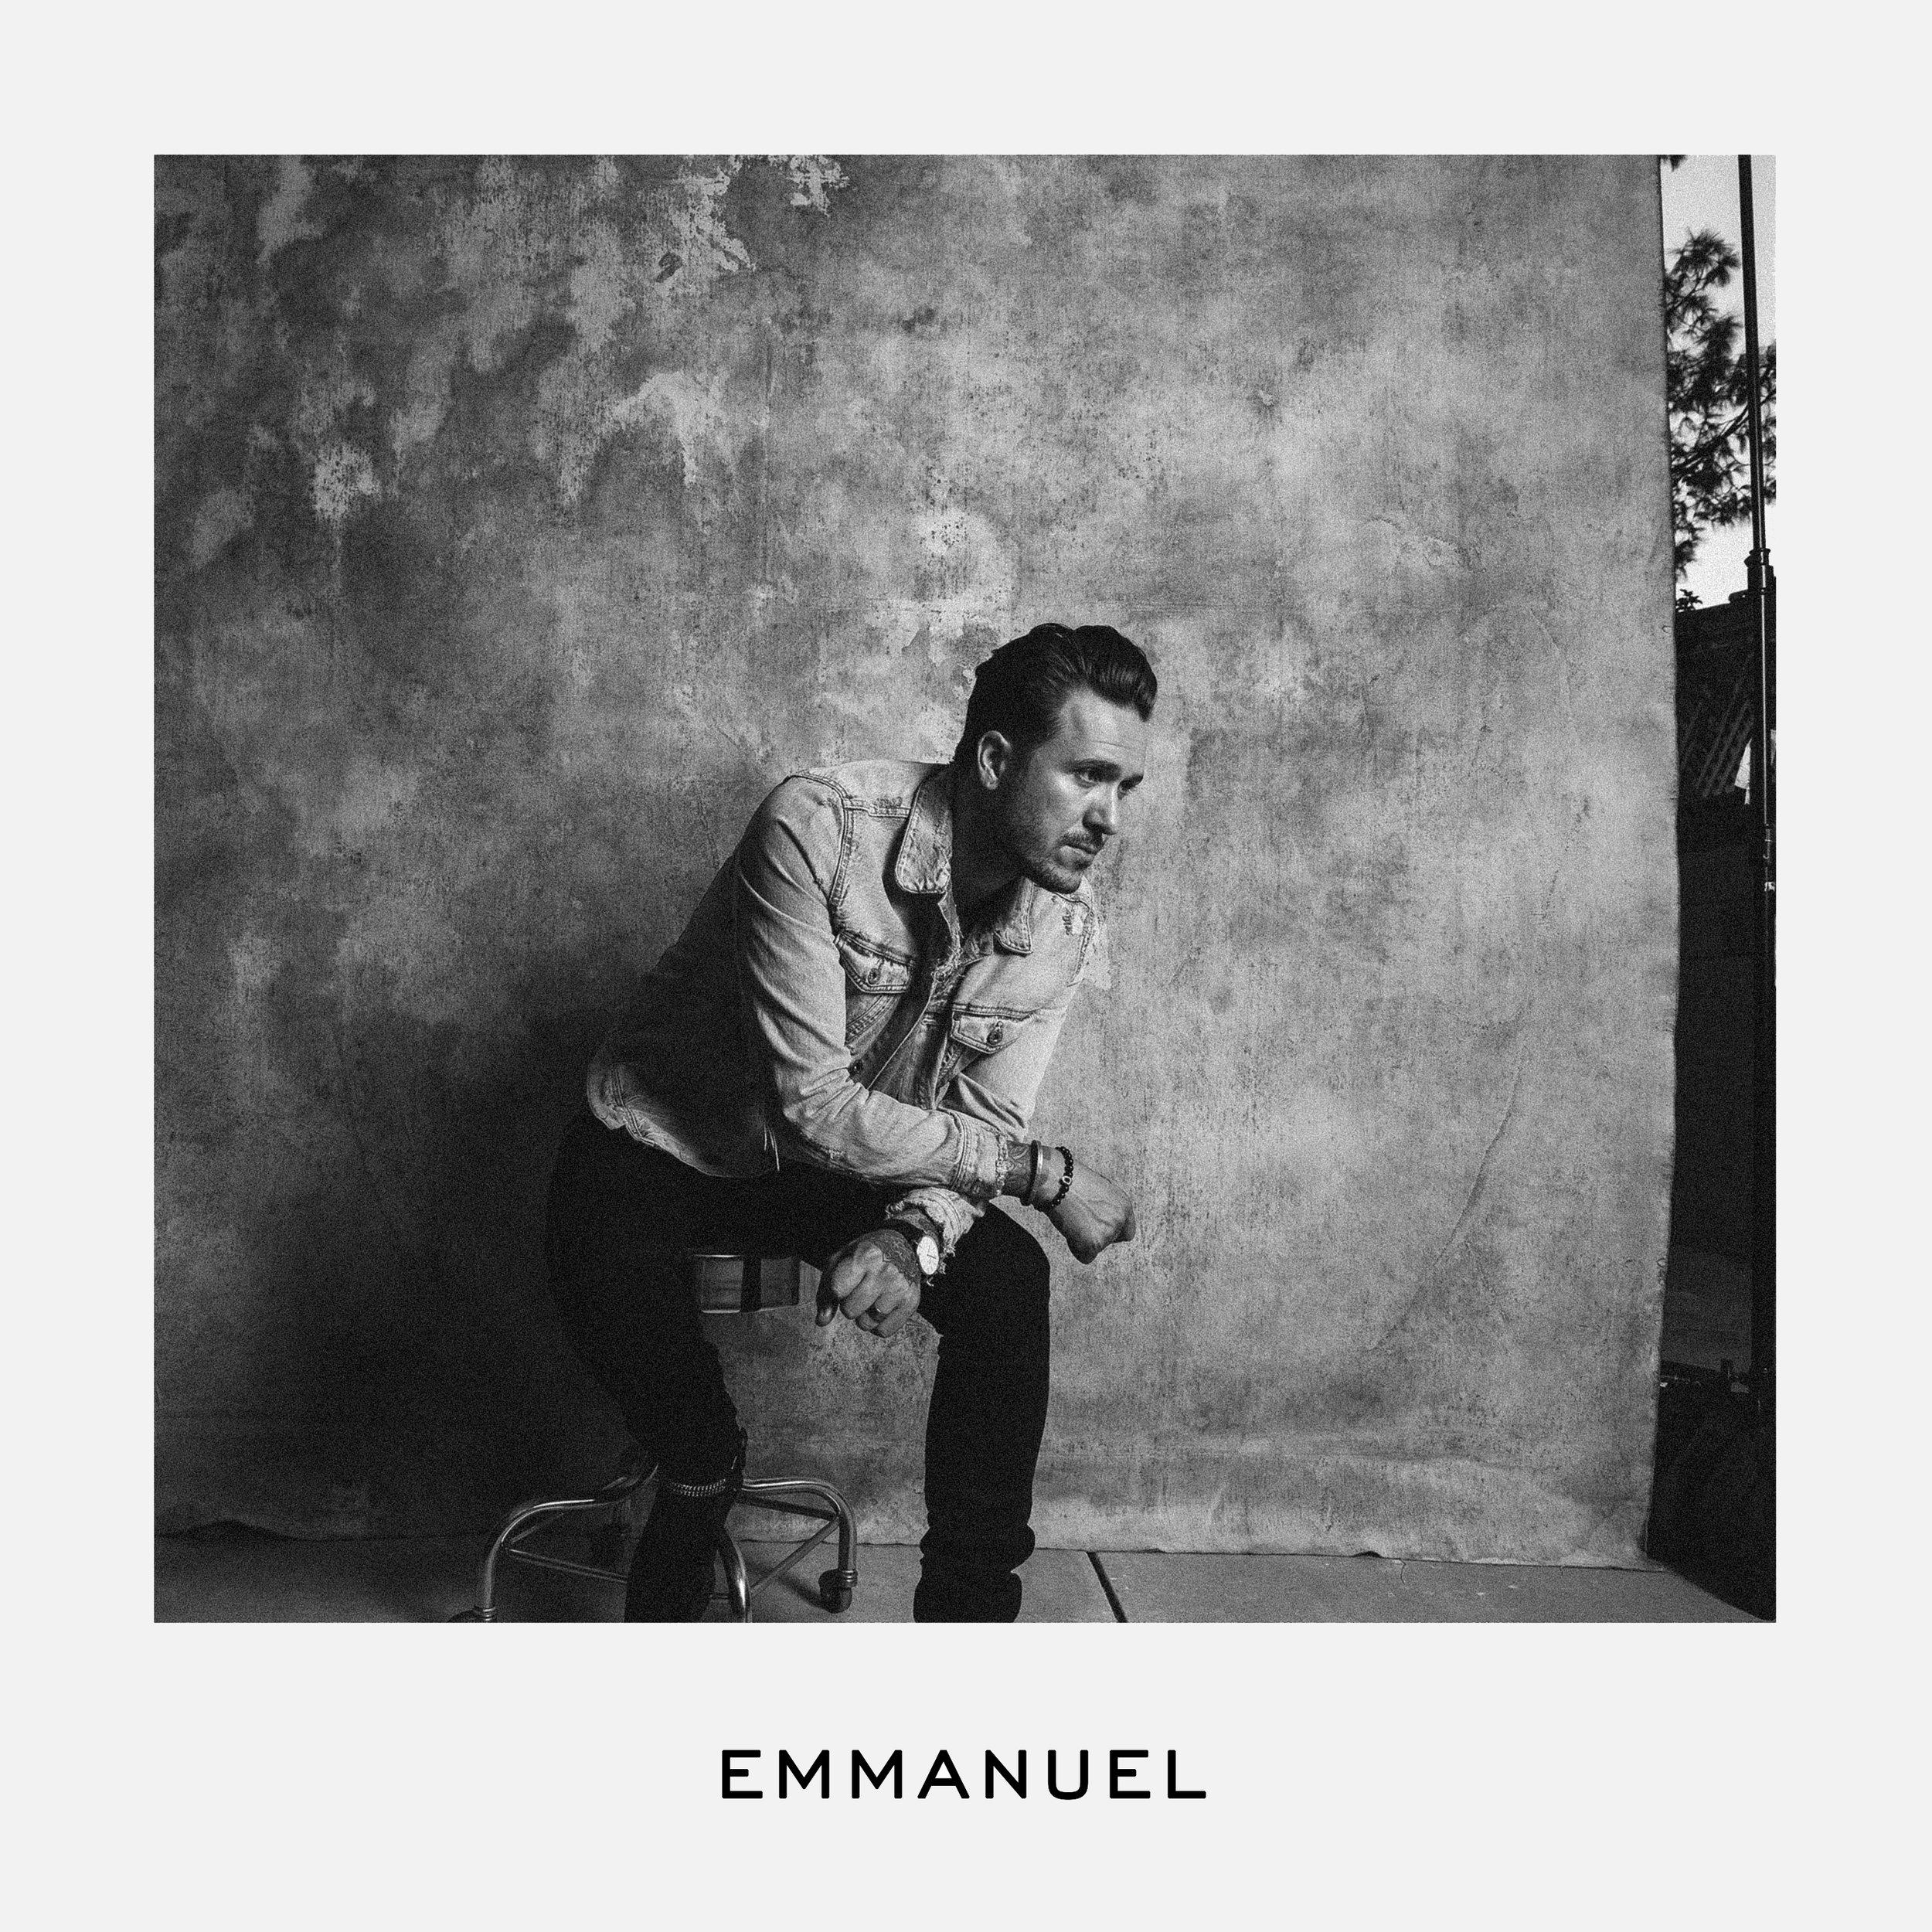 Emmanuel copy.jpg